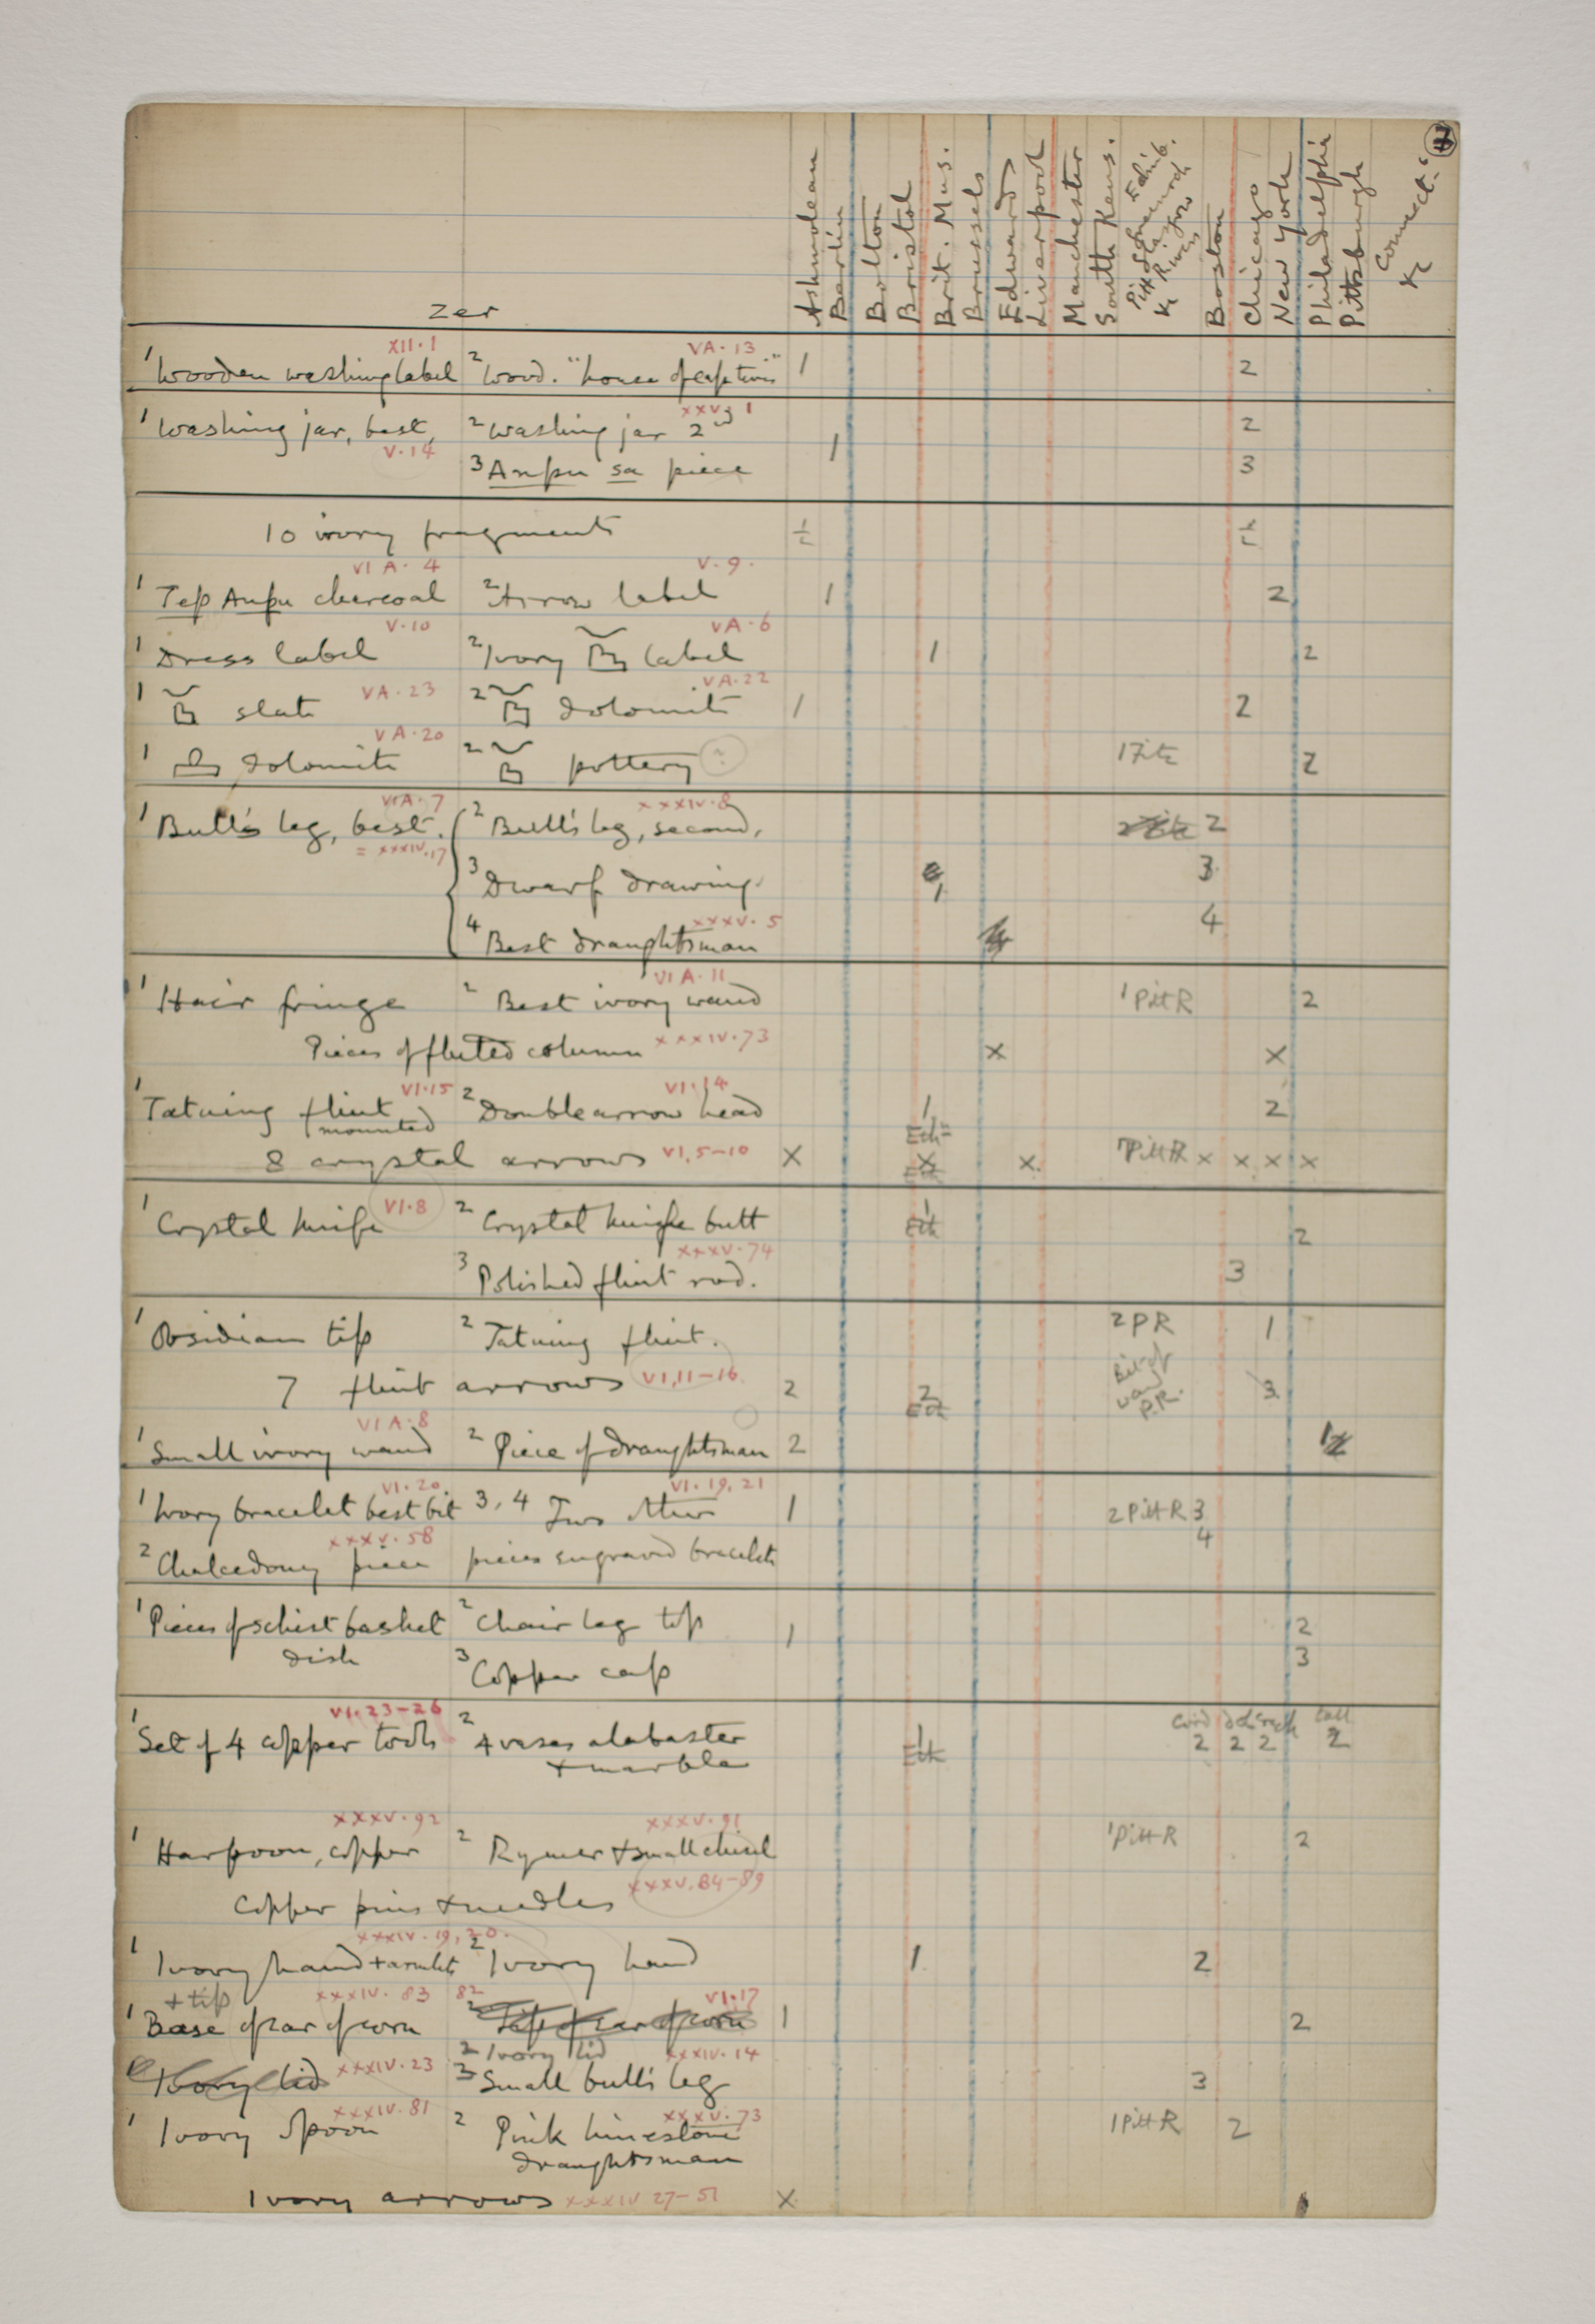 1900-01 Abydos, Bet Khallaf, el-Mahasna Distribution grid PMA/WFP1/D/9/7